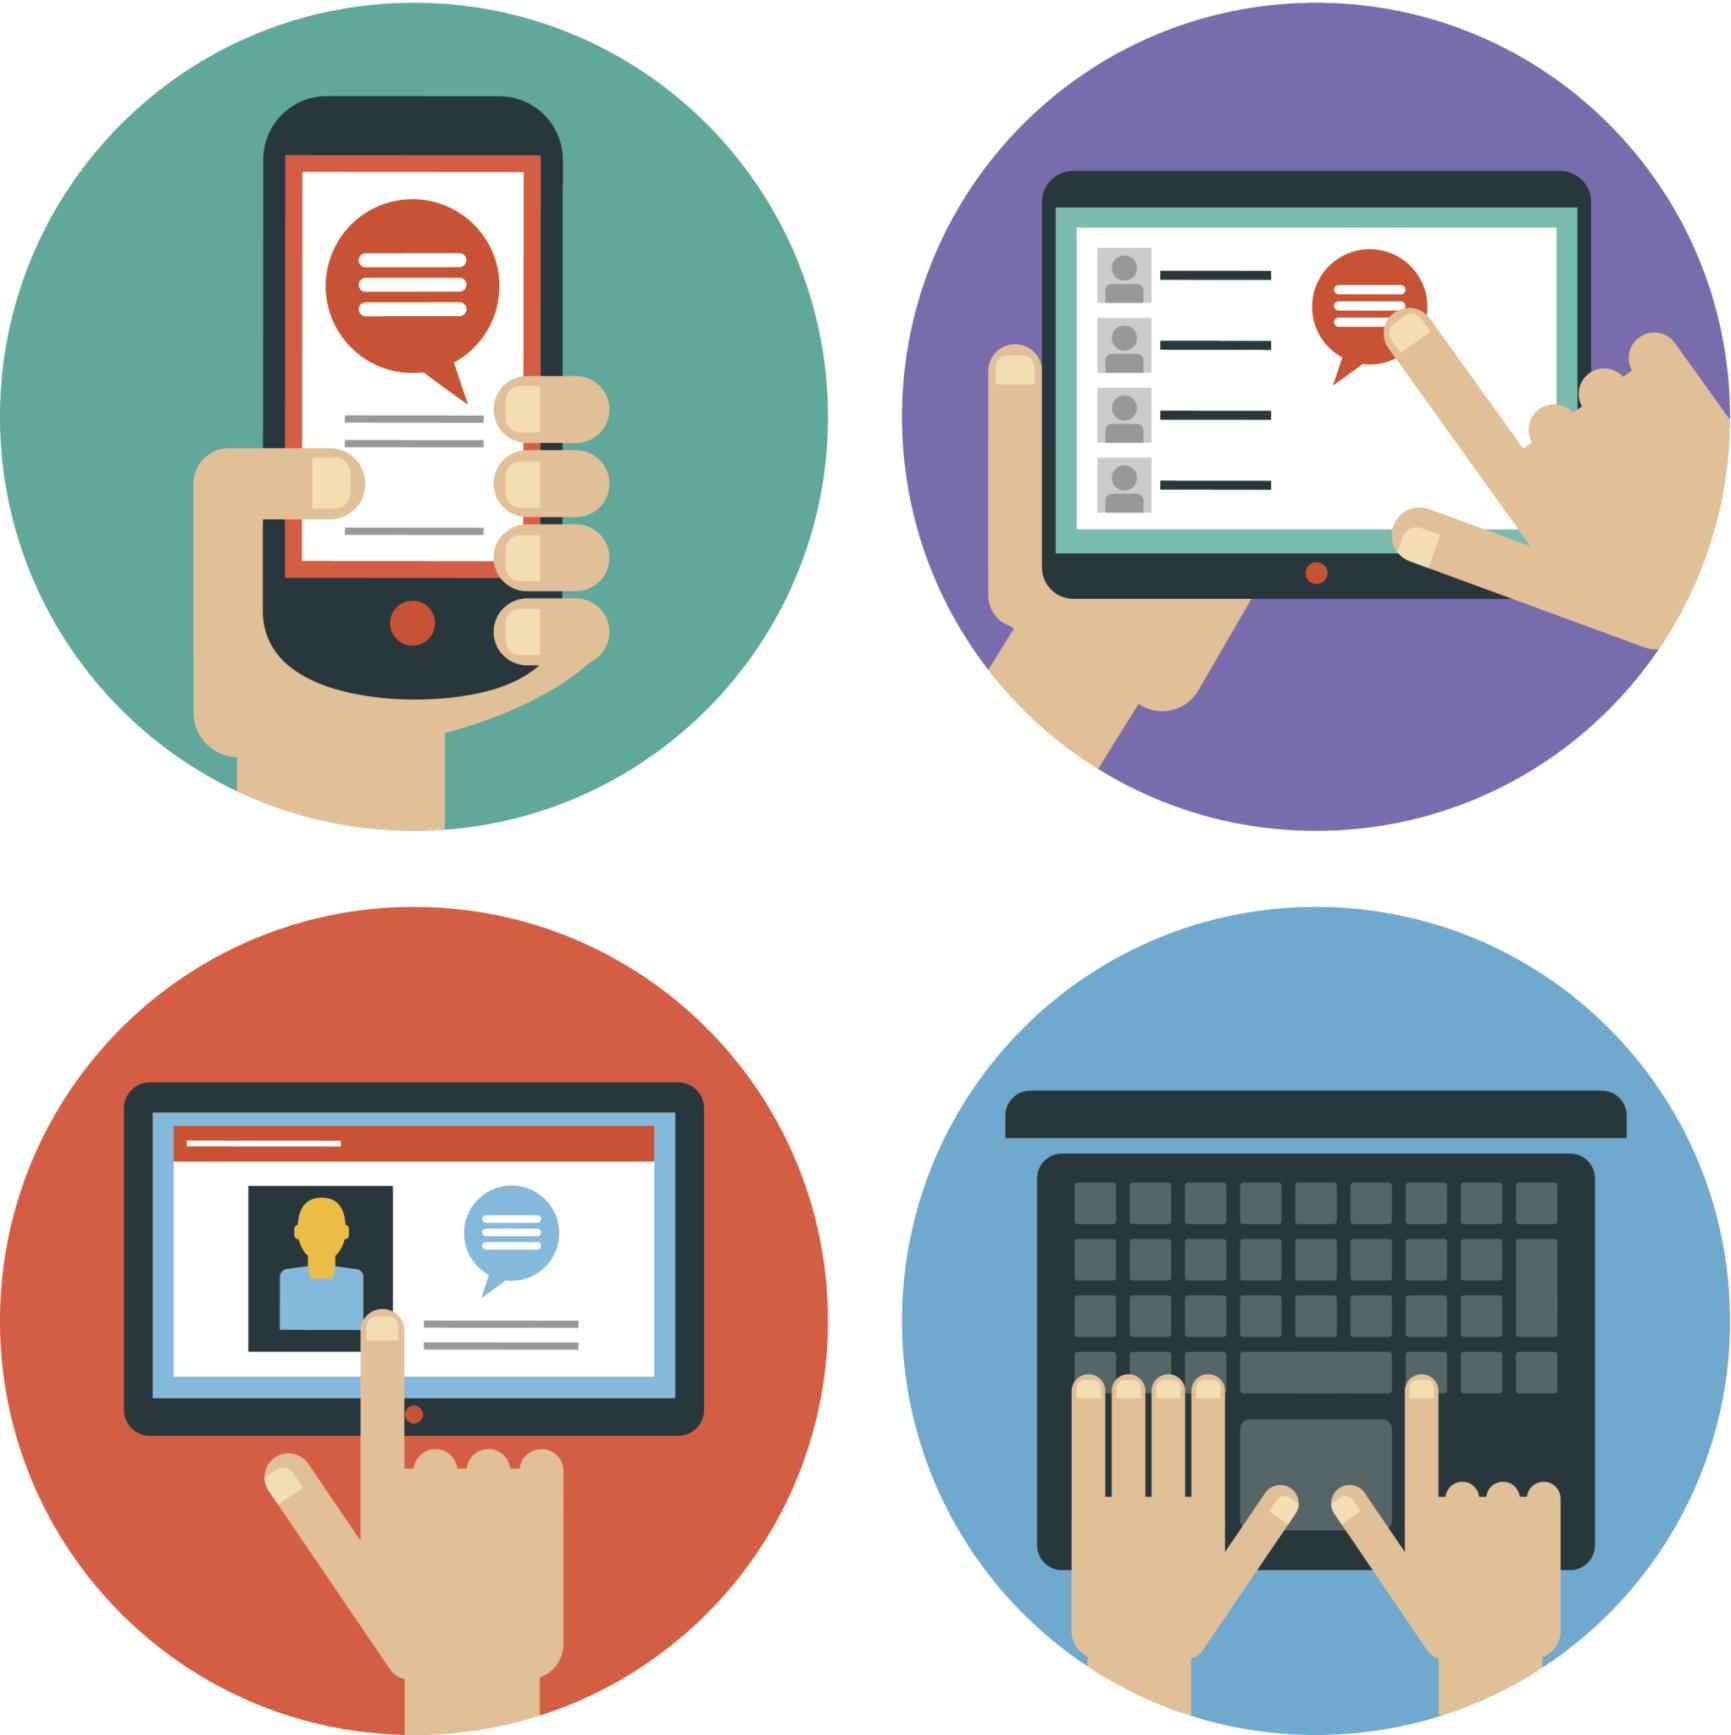 webrtc tablet, laptop and smart phone